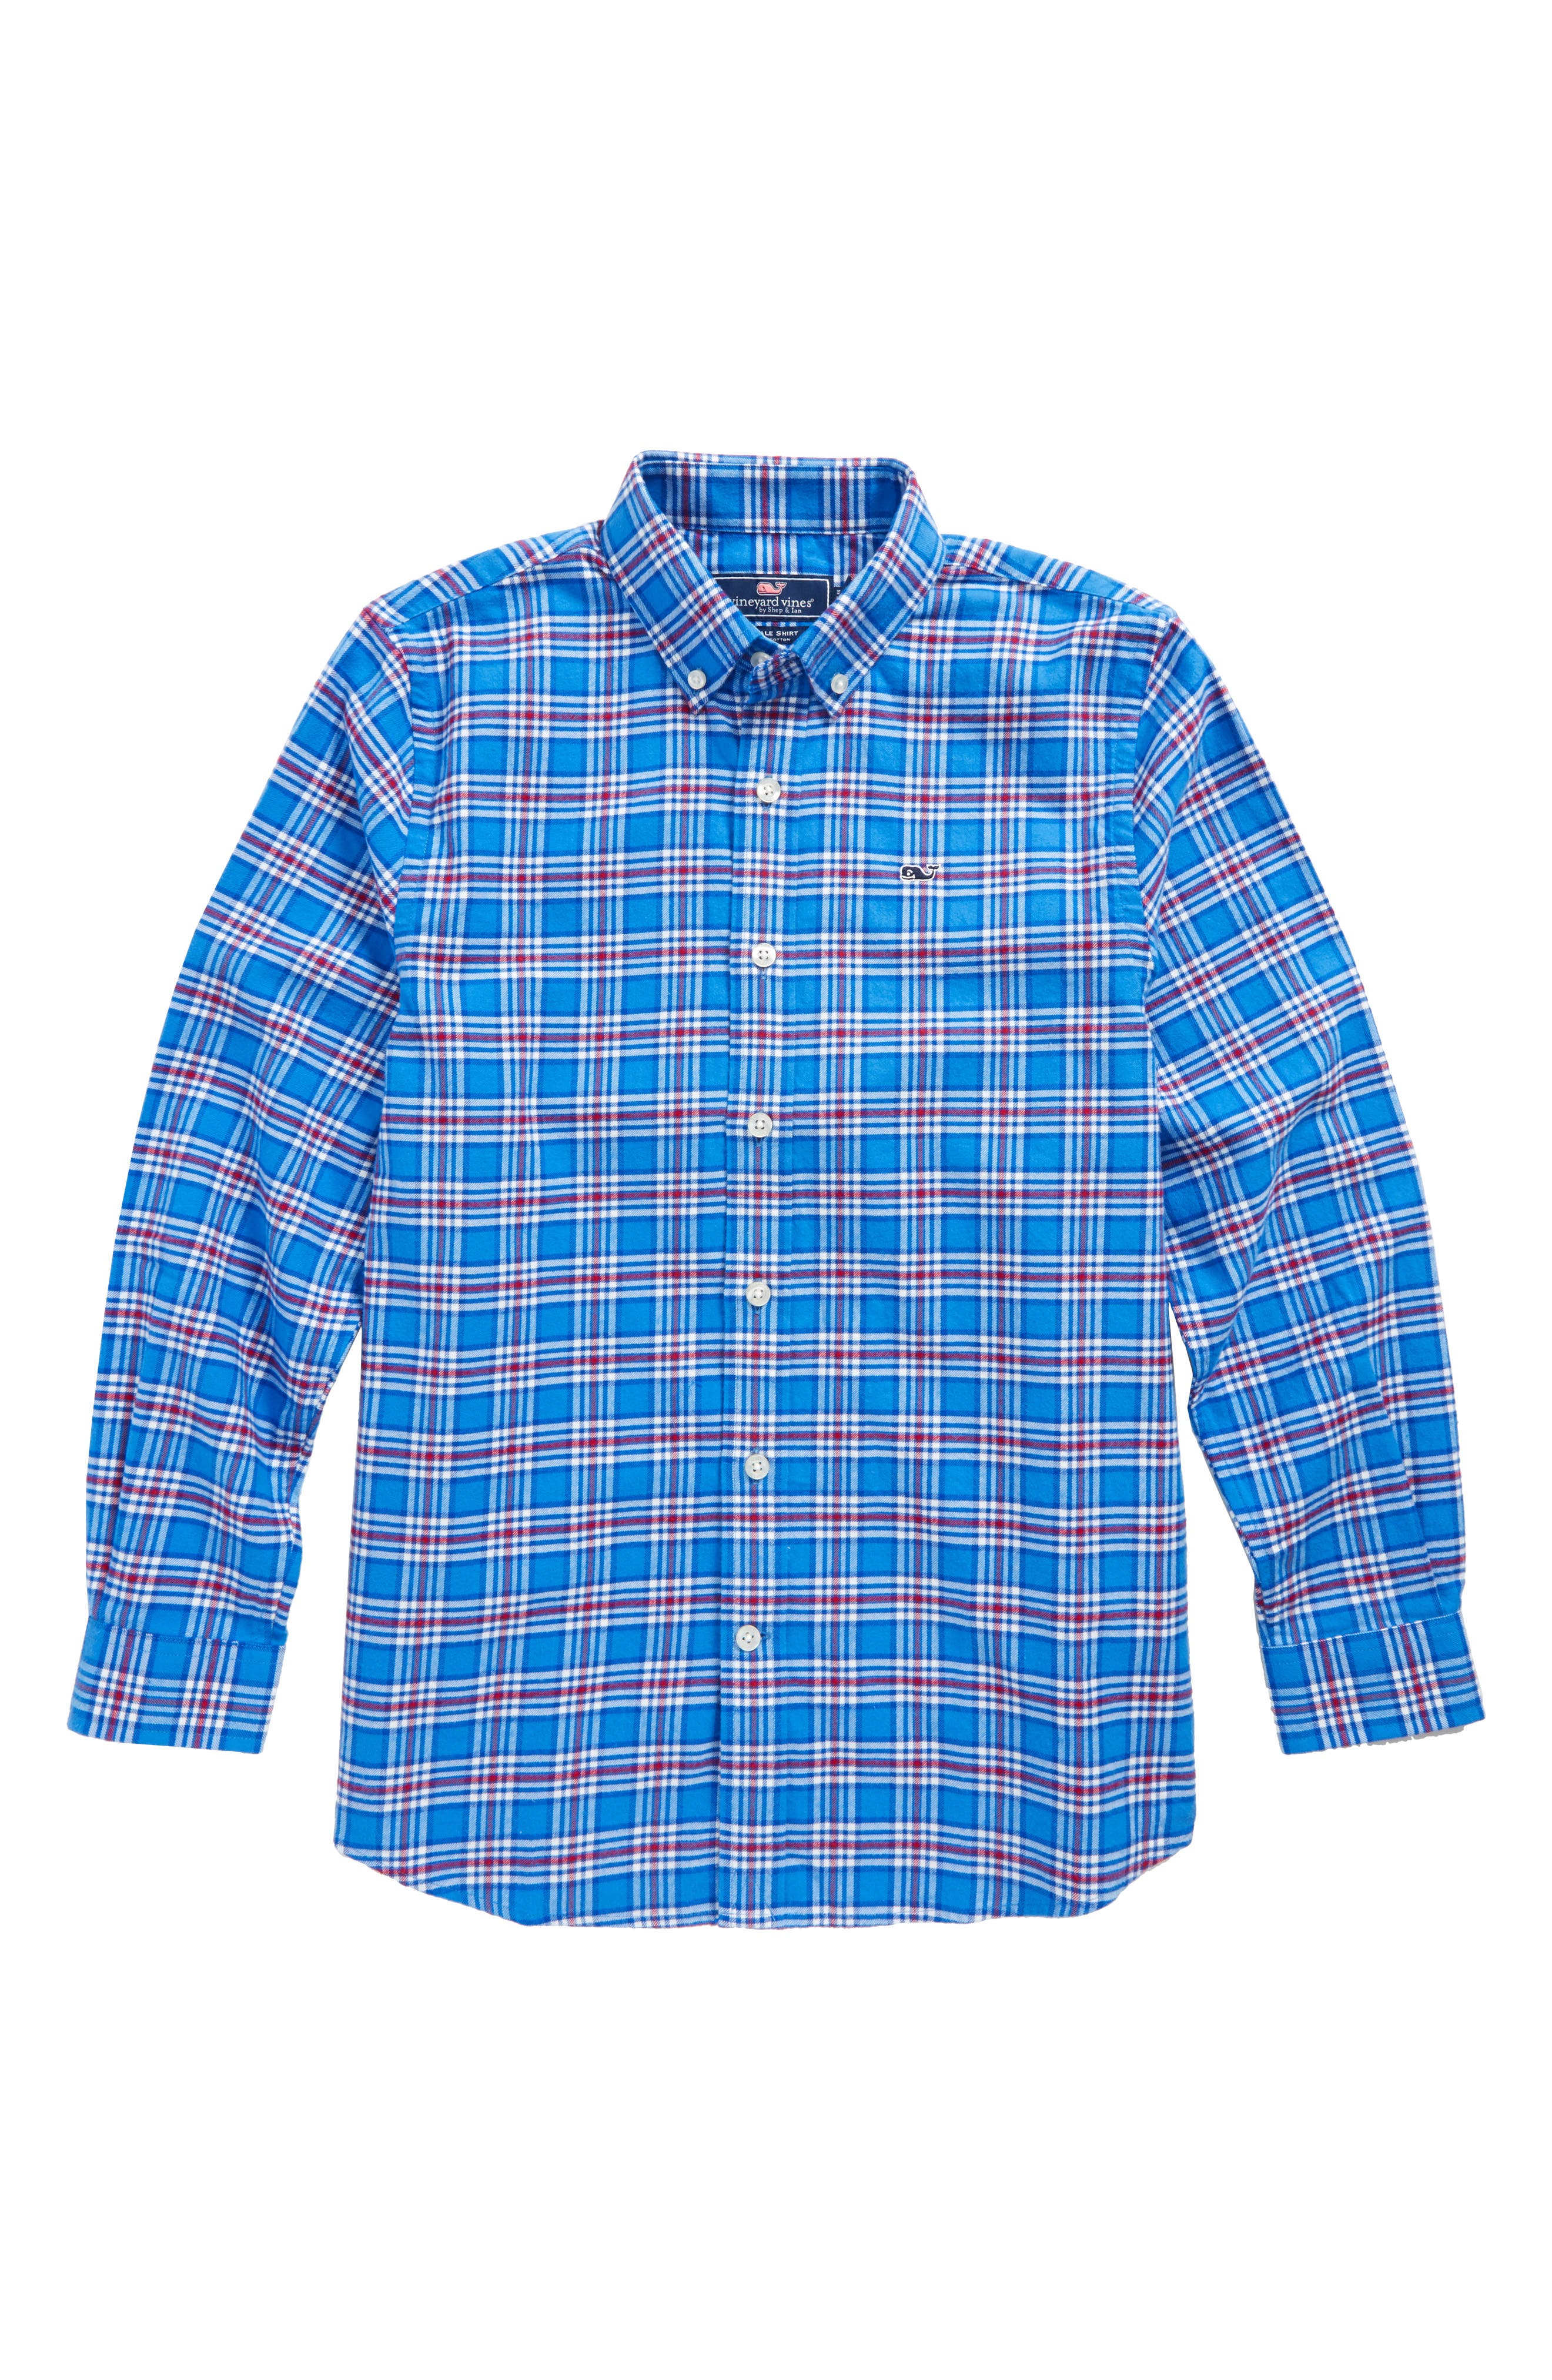 vineyard vines Chandler Pond Plaid Flannel Shirt (Big Boys)